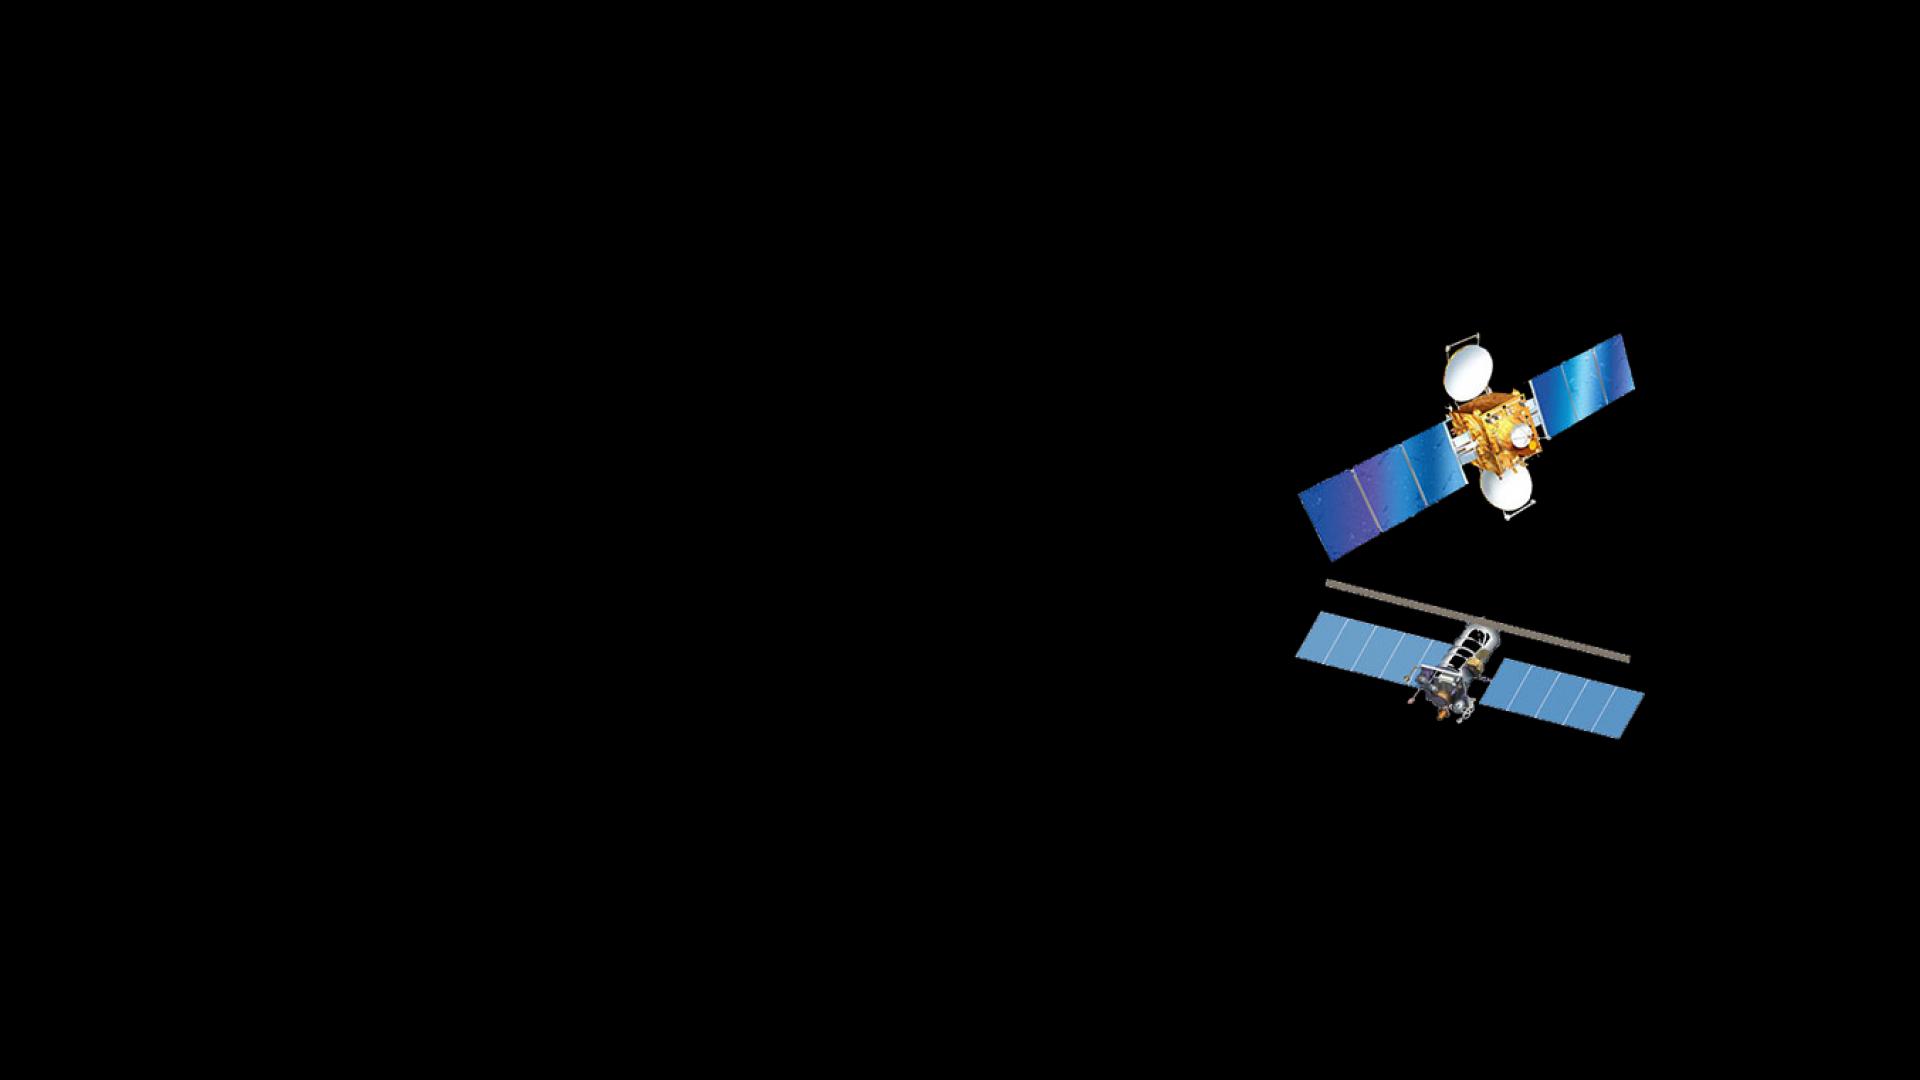 Electro-L N2 and INSAT-3D satellites